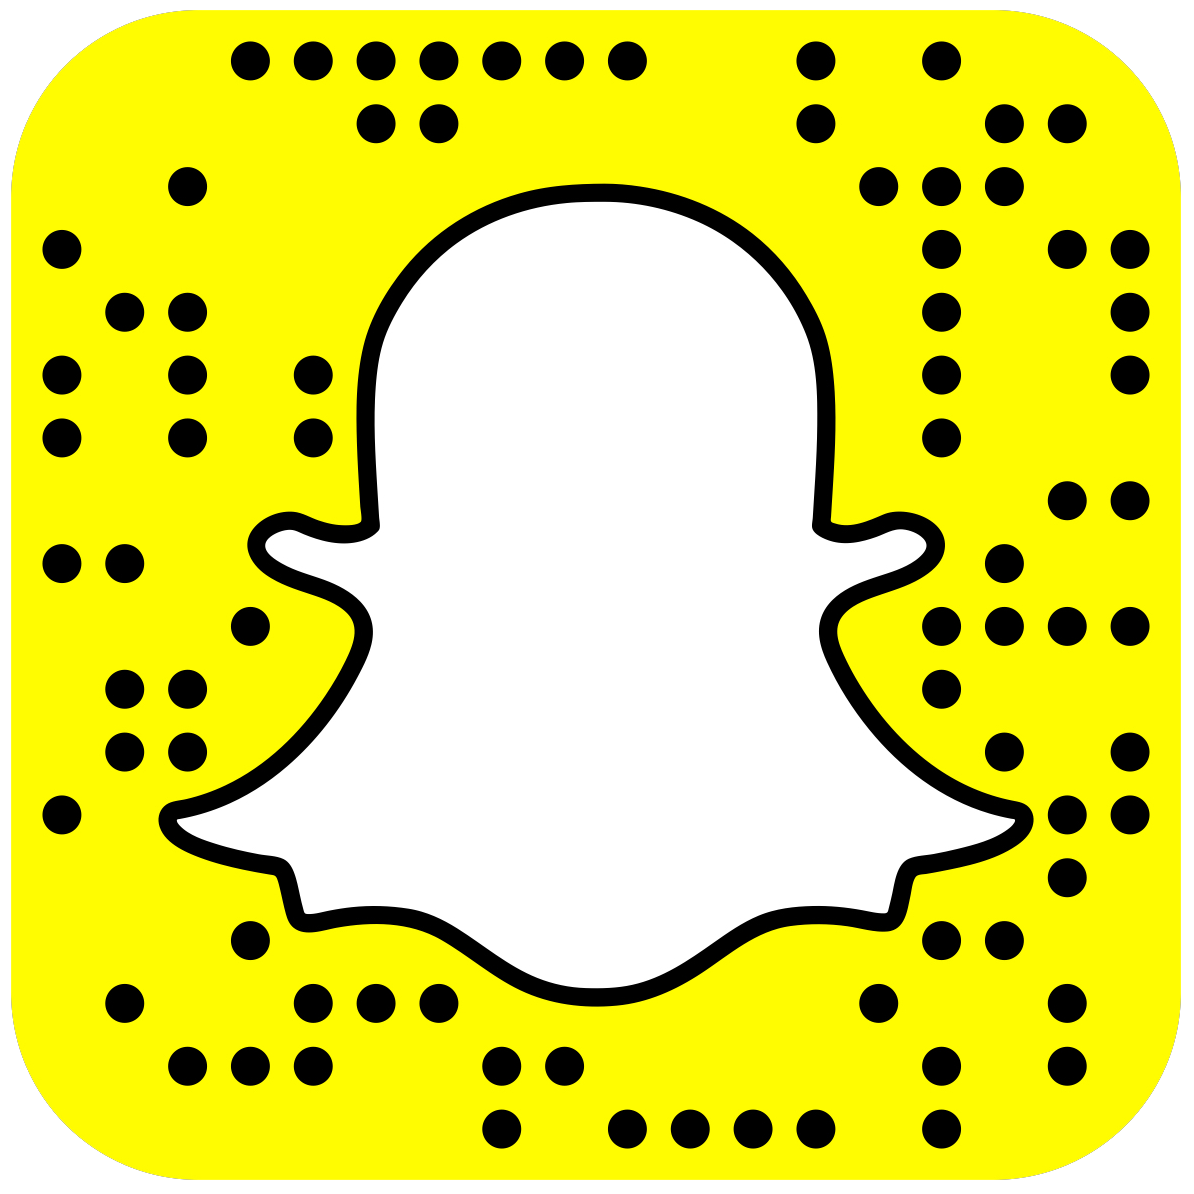 Kailyn Lowry Snapchat username